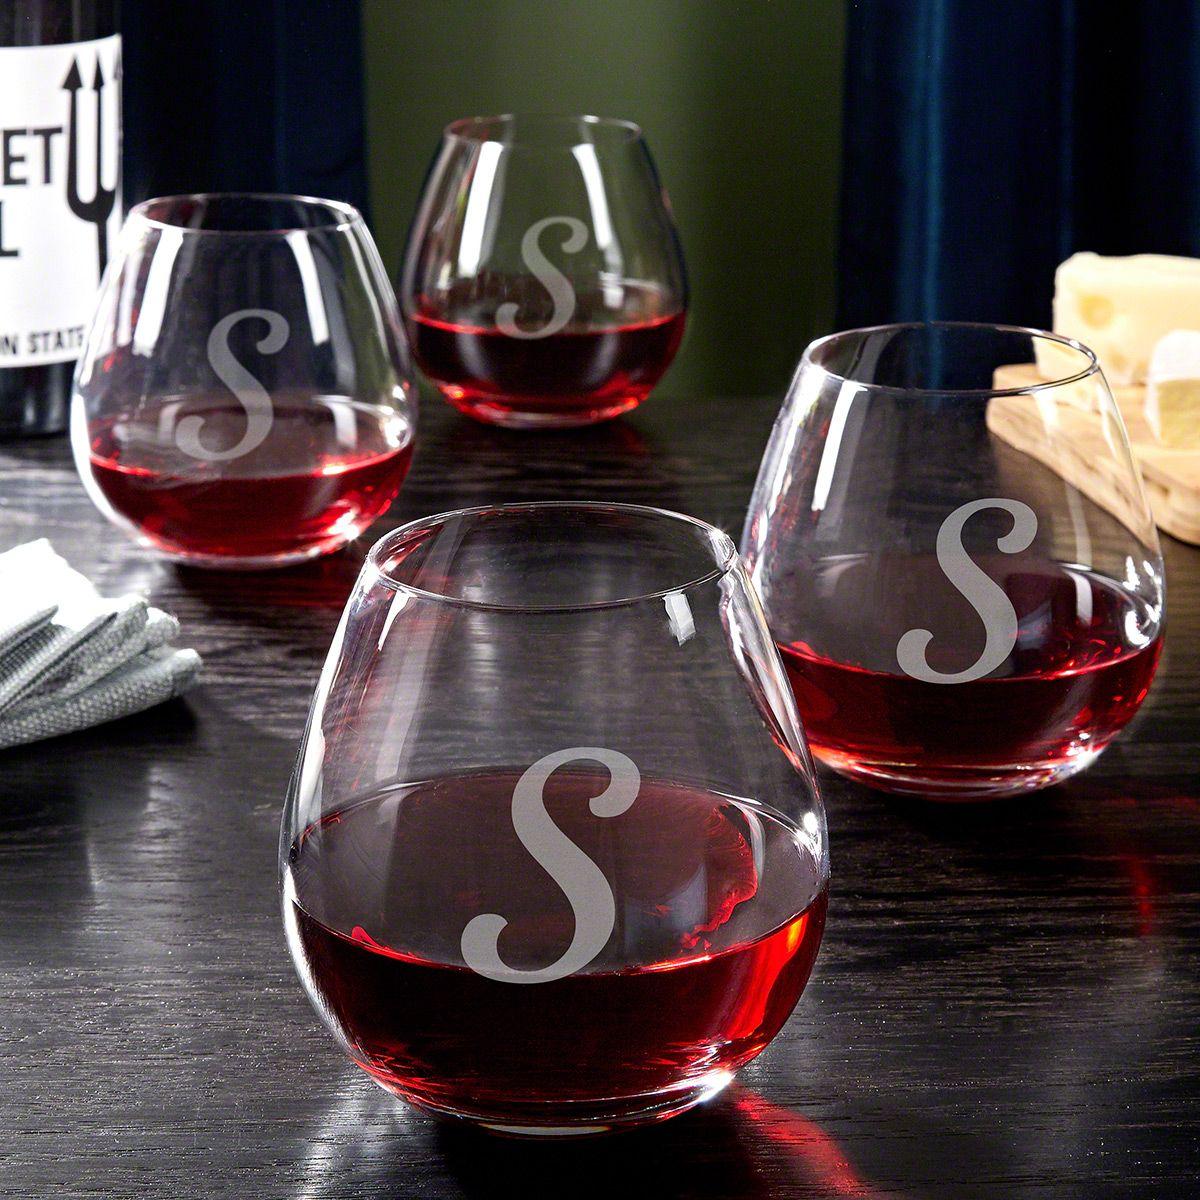 Viviani Personalized Stemless Wine Glasses, Set of 4